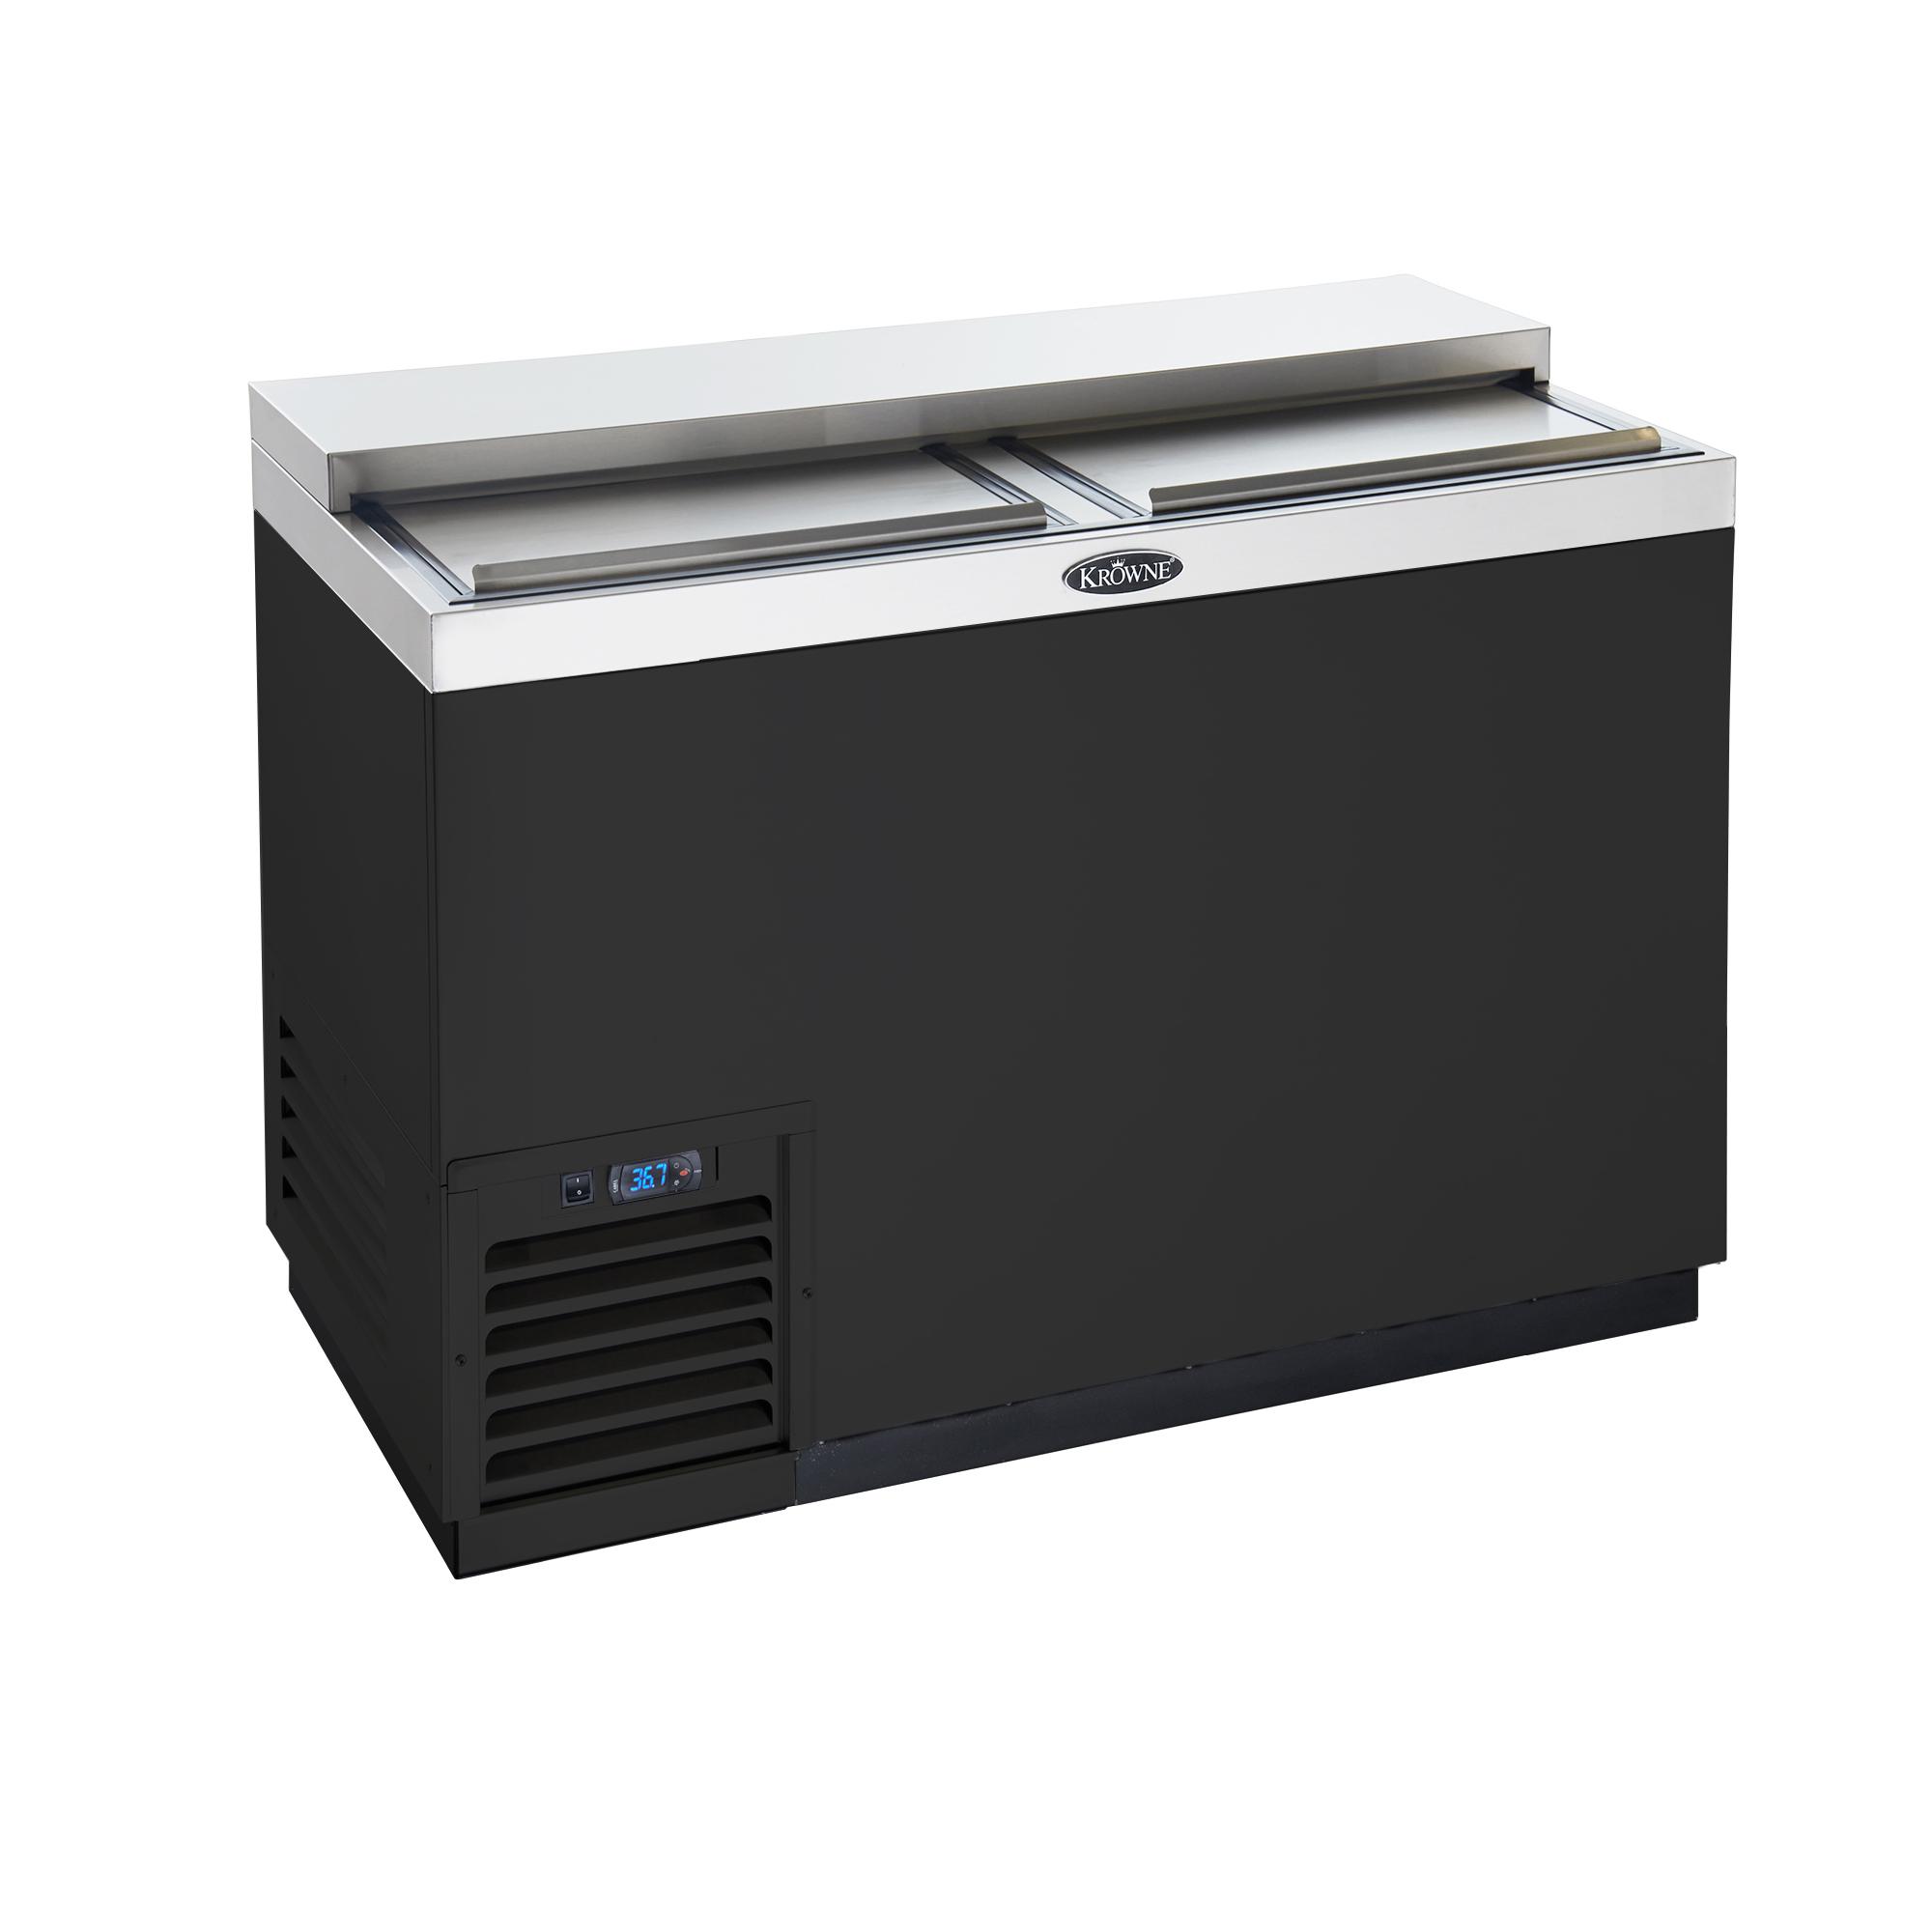 Krowne Metal BC48-BG refrigeration